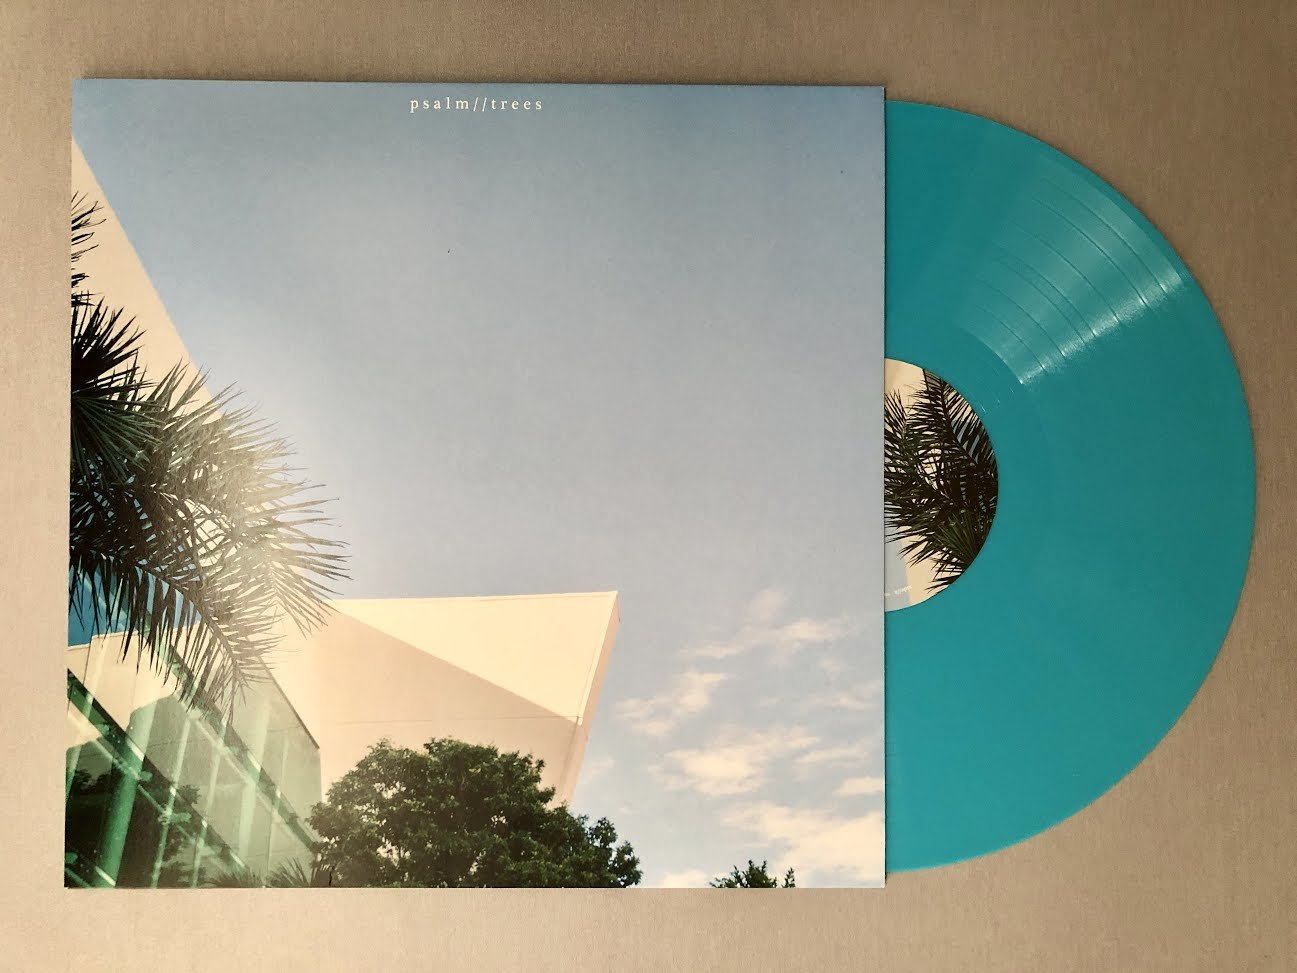 Psalm//trees (Sky Blue Turquoise Vinyl)